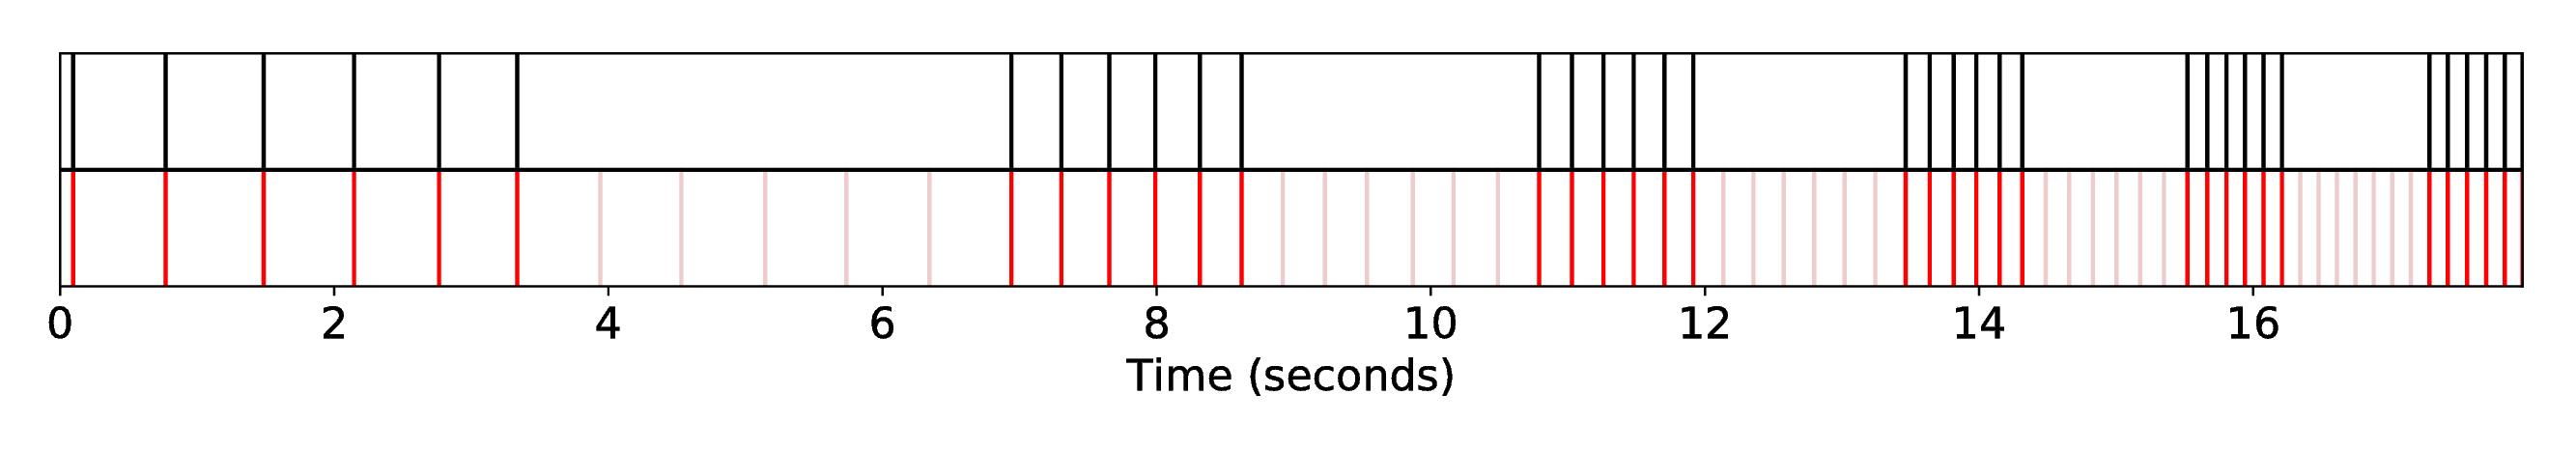 DP1_INT1_R-Syn-InGa__S-Fandango__SequenceAlignment